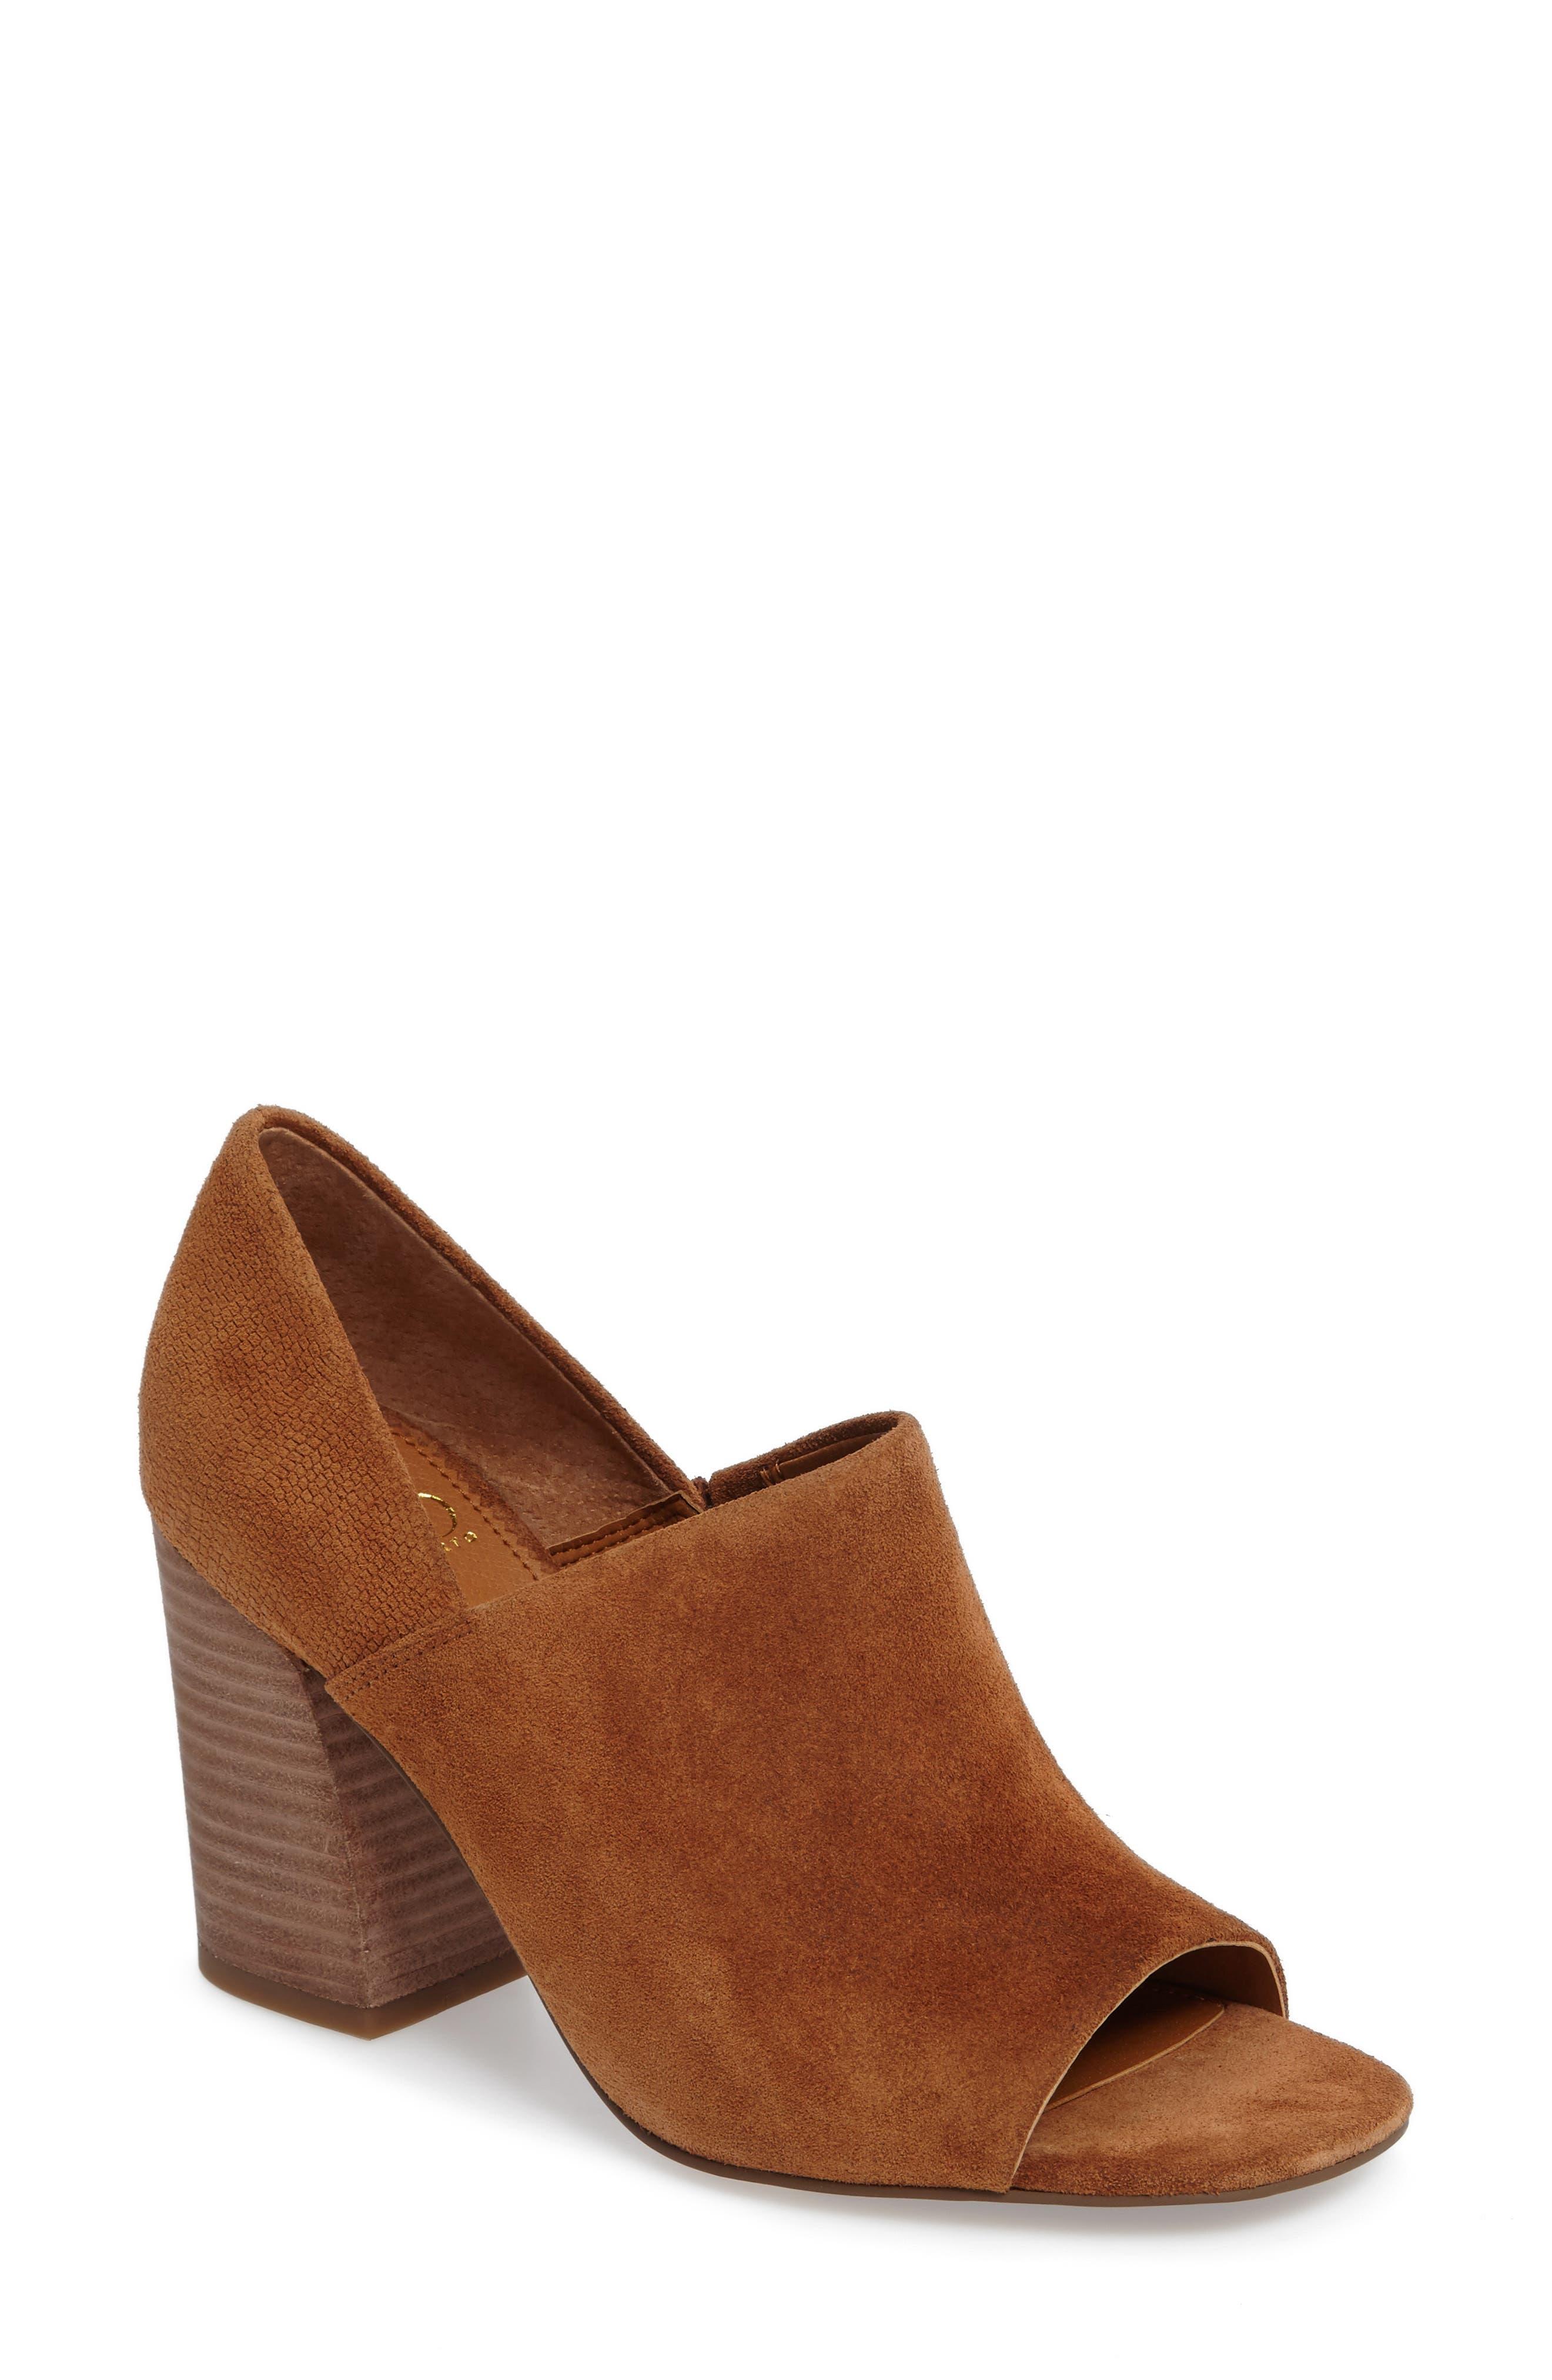 Ellison Block Heel Sandal,                         Main,                         color, Whiskey Suede